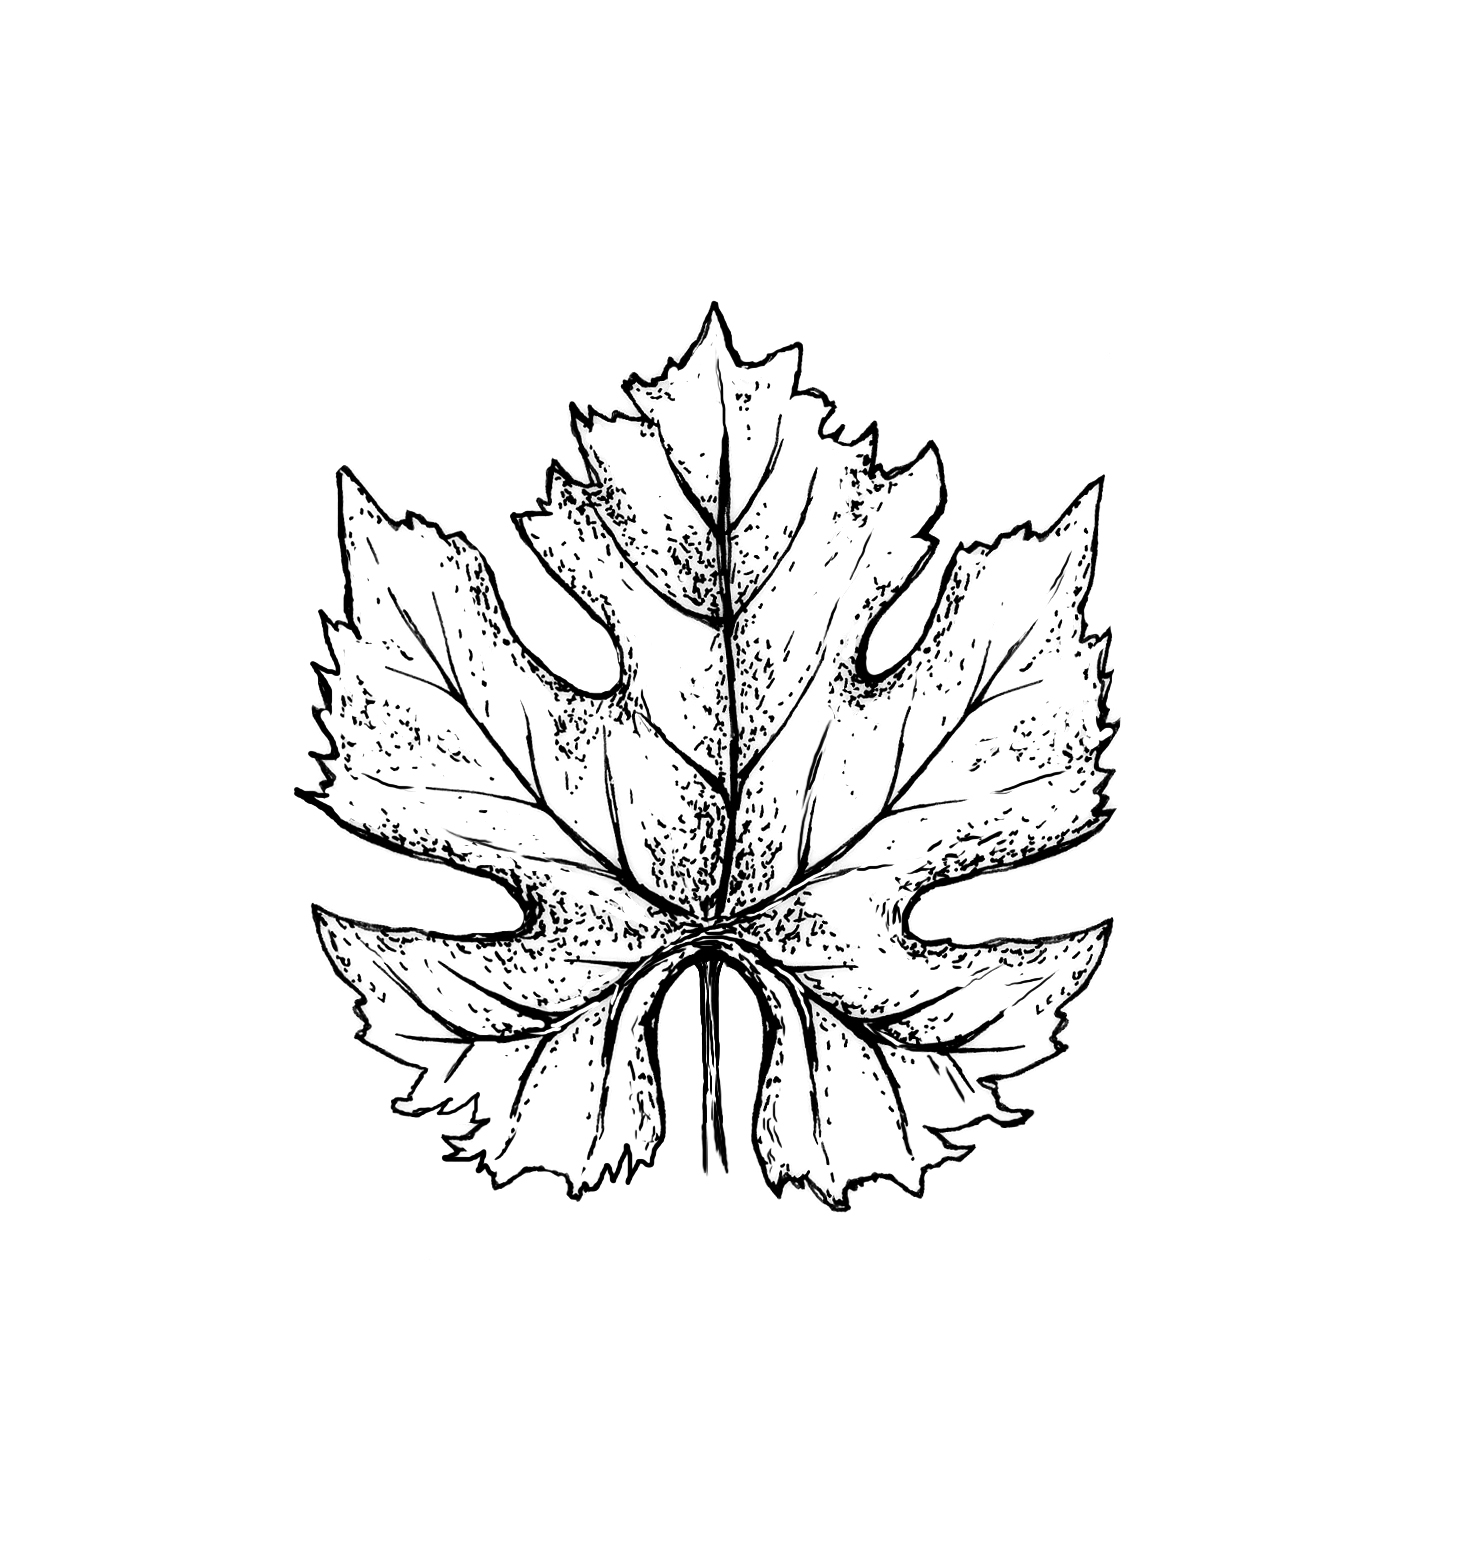 merlot-leaf.jpg